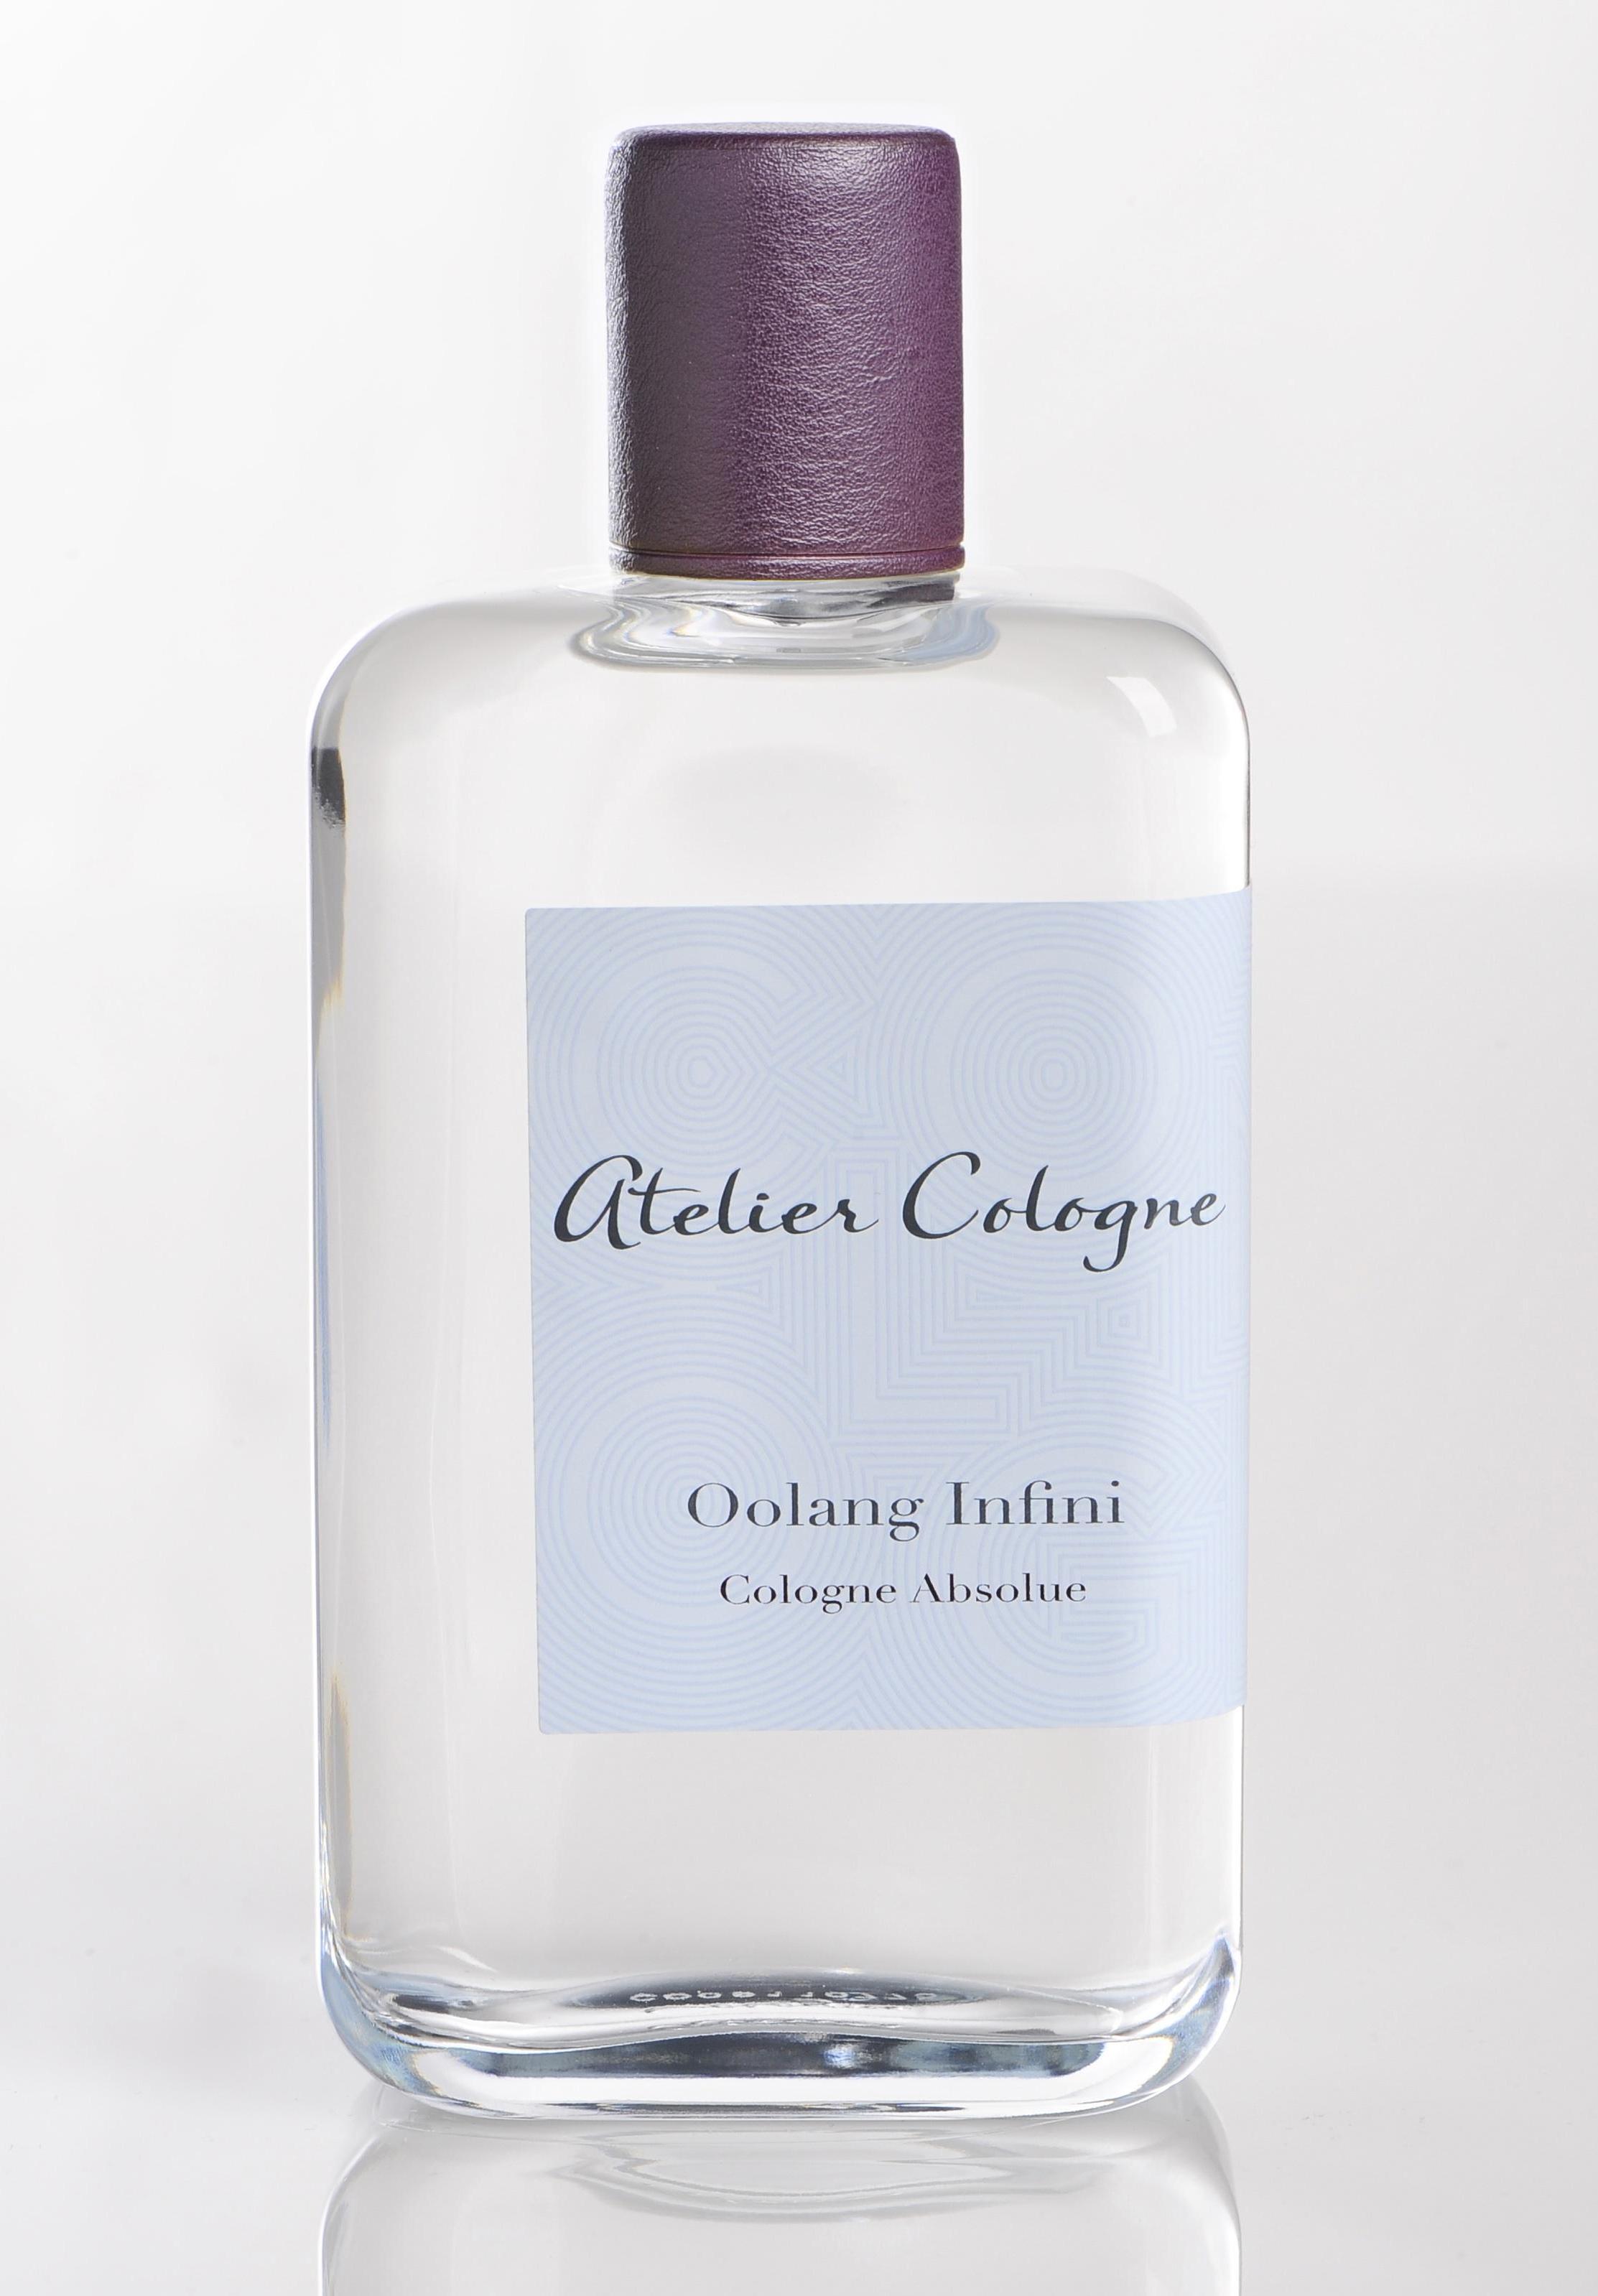 Elizabeth Arden Perfume Names